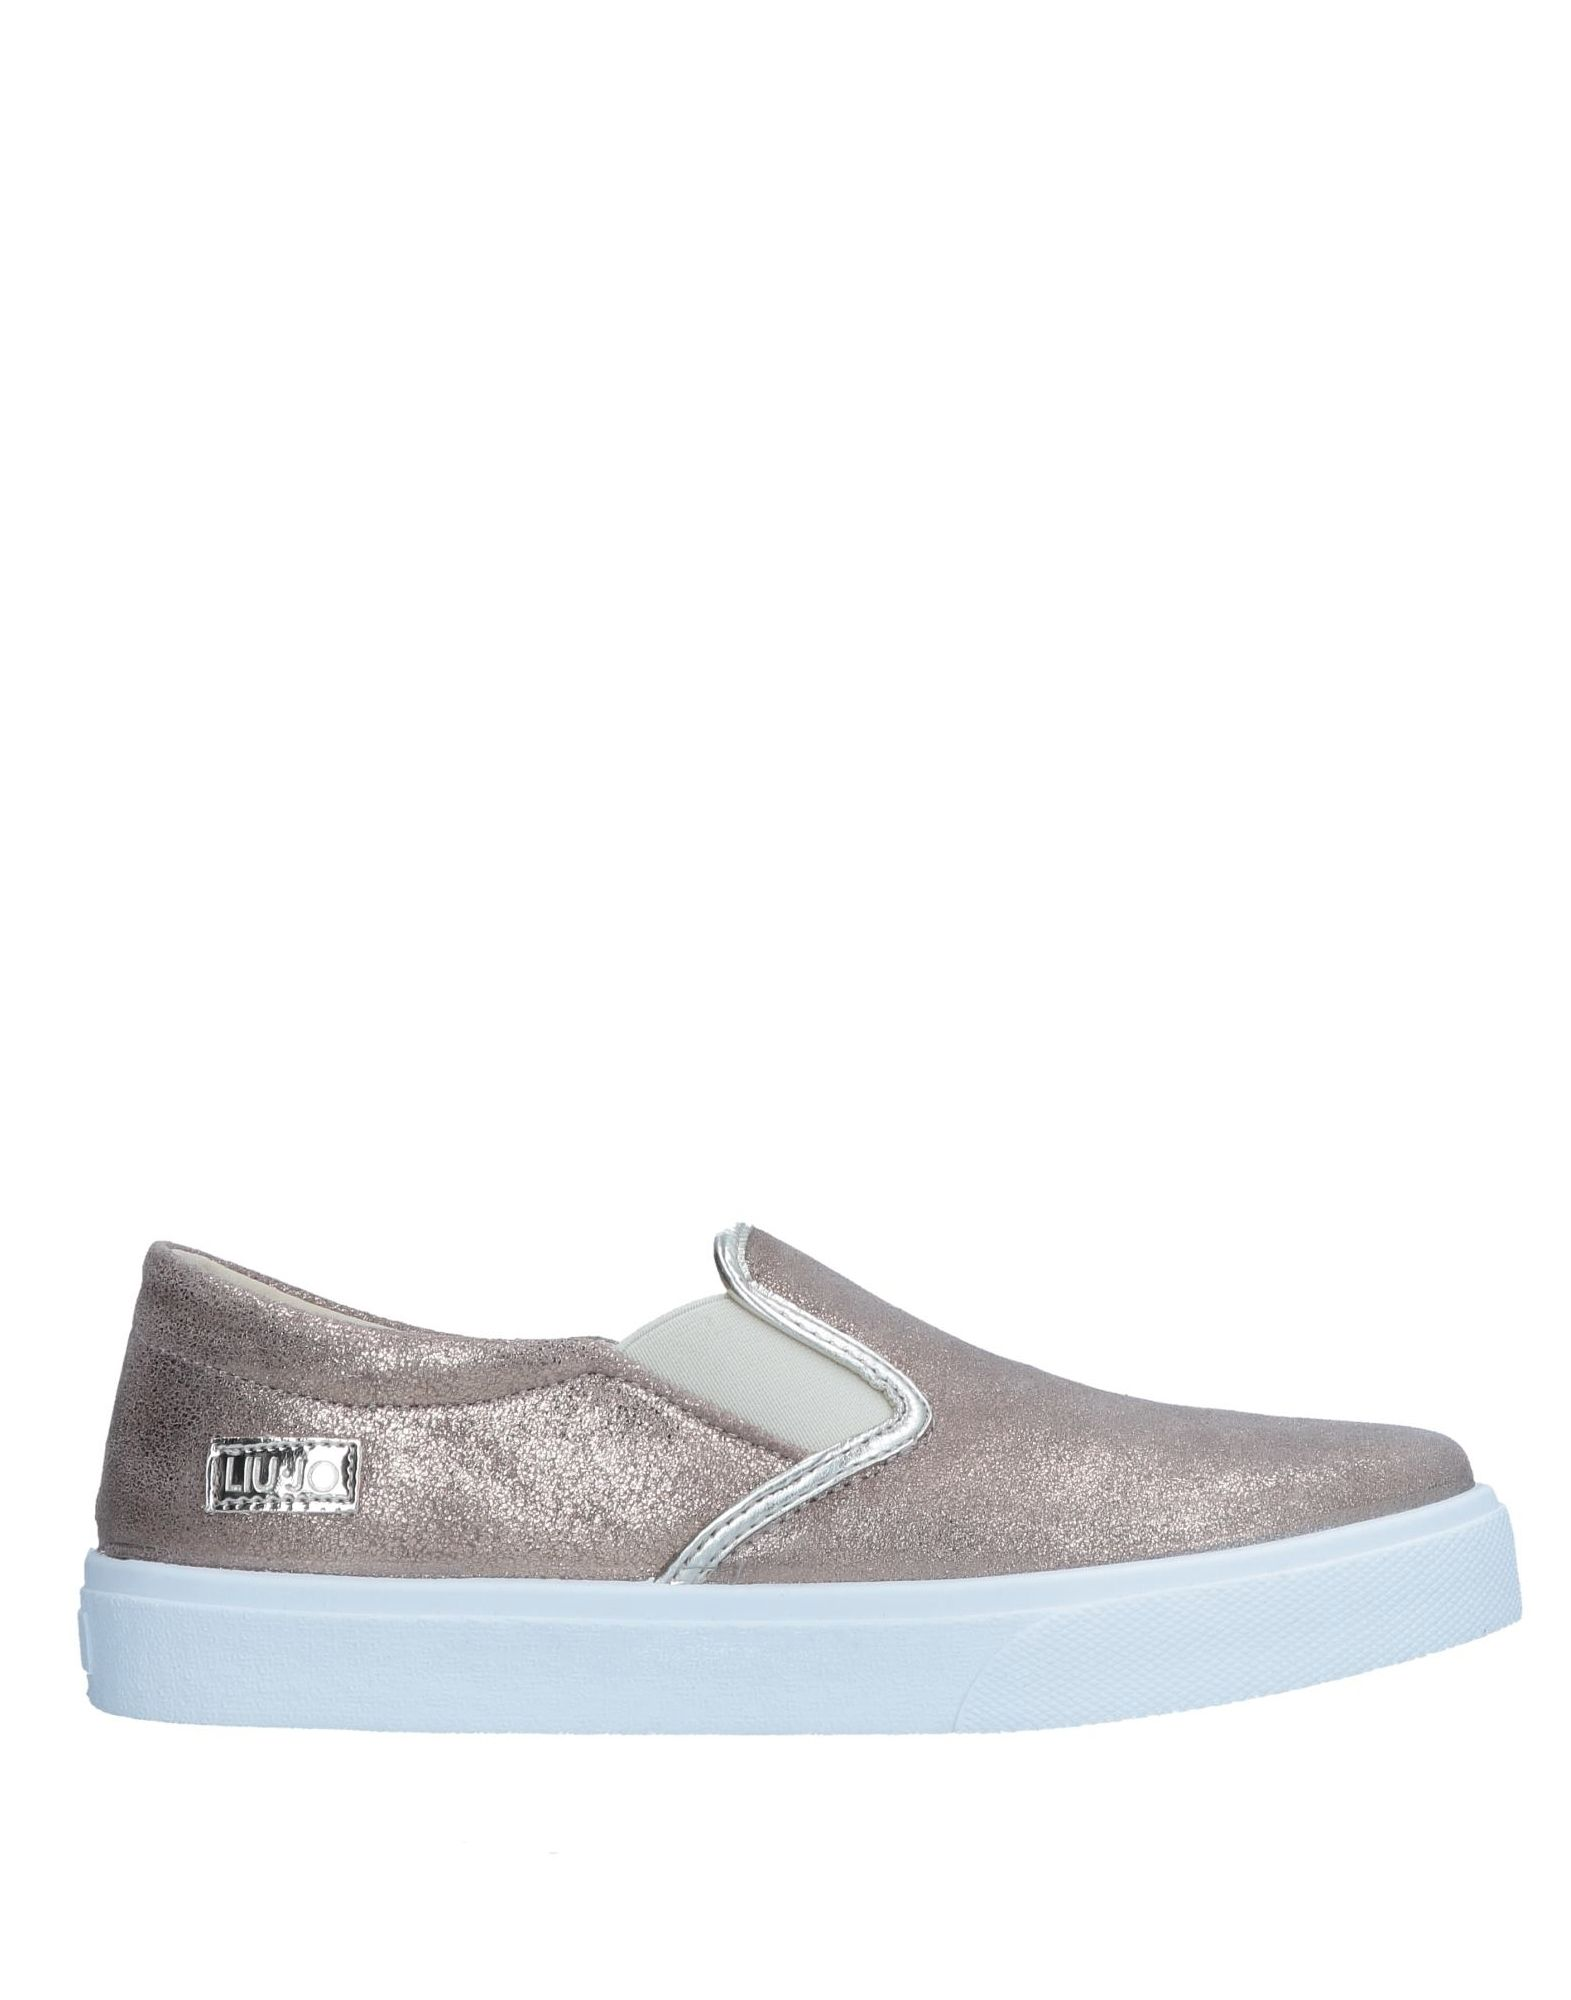 Liu •Jo Shoes Sneakers Damen  11545865SM Gute Qualität beliebte Schuhe